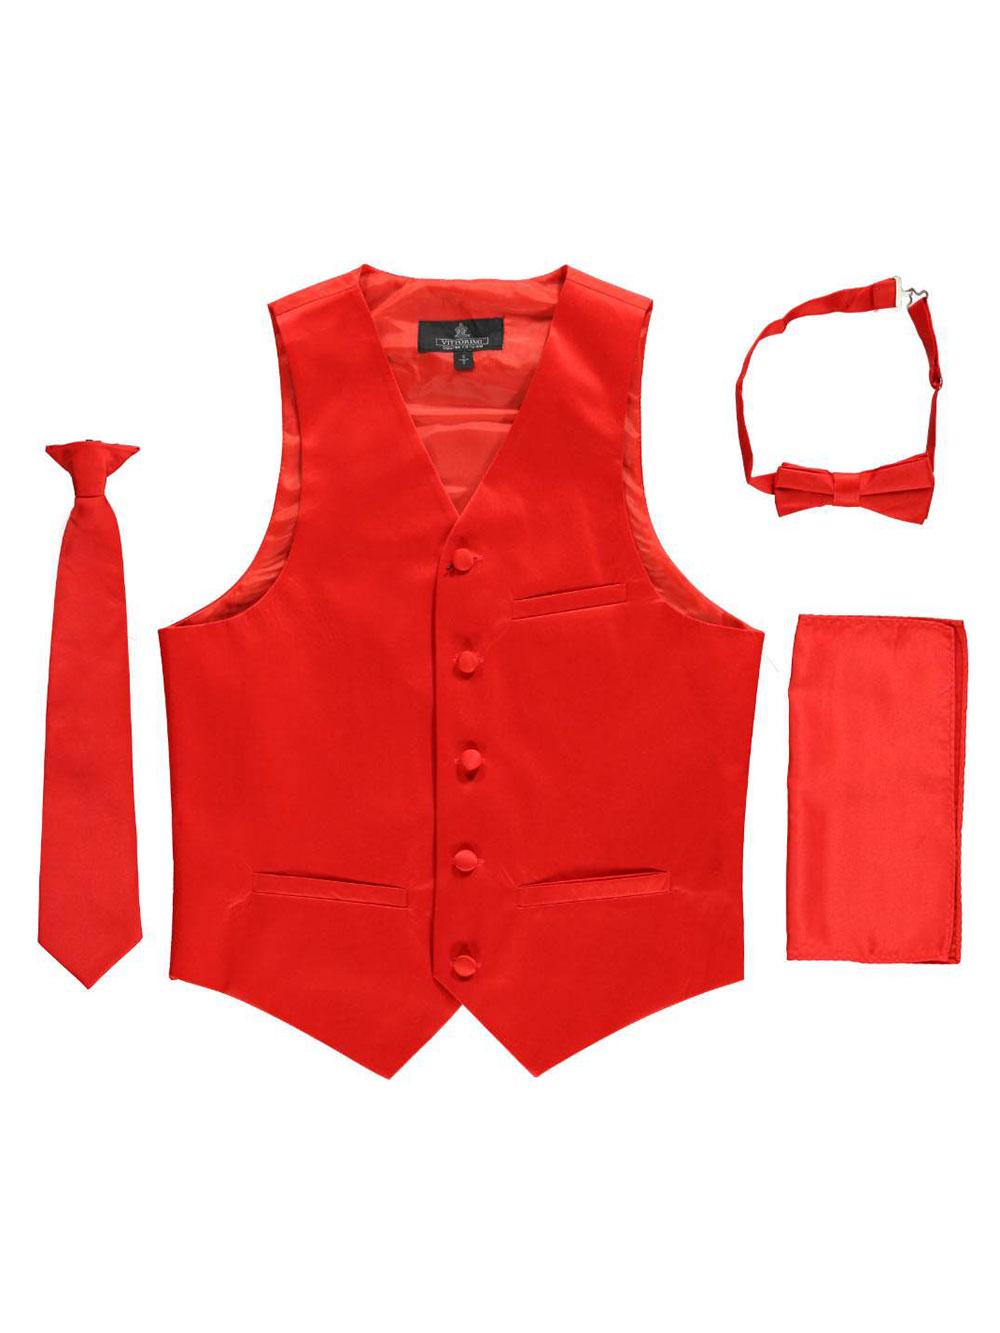 Vittorino Big Boys' 4-Piece Vest & Accessories Set (Sizes 8 - 20) - red, 18 - 20